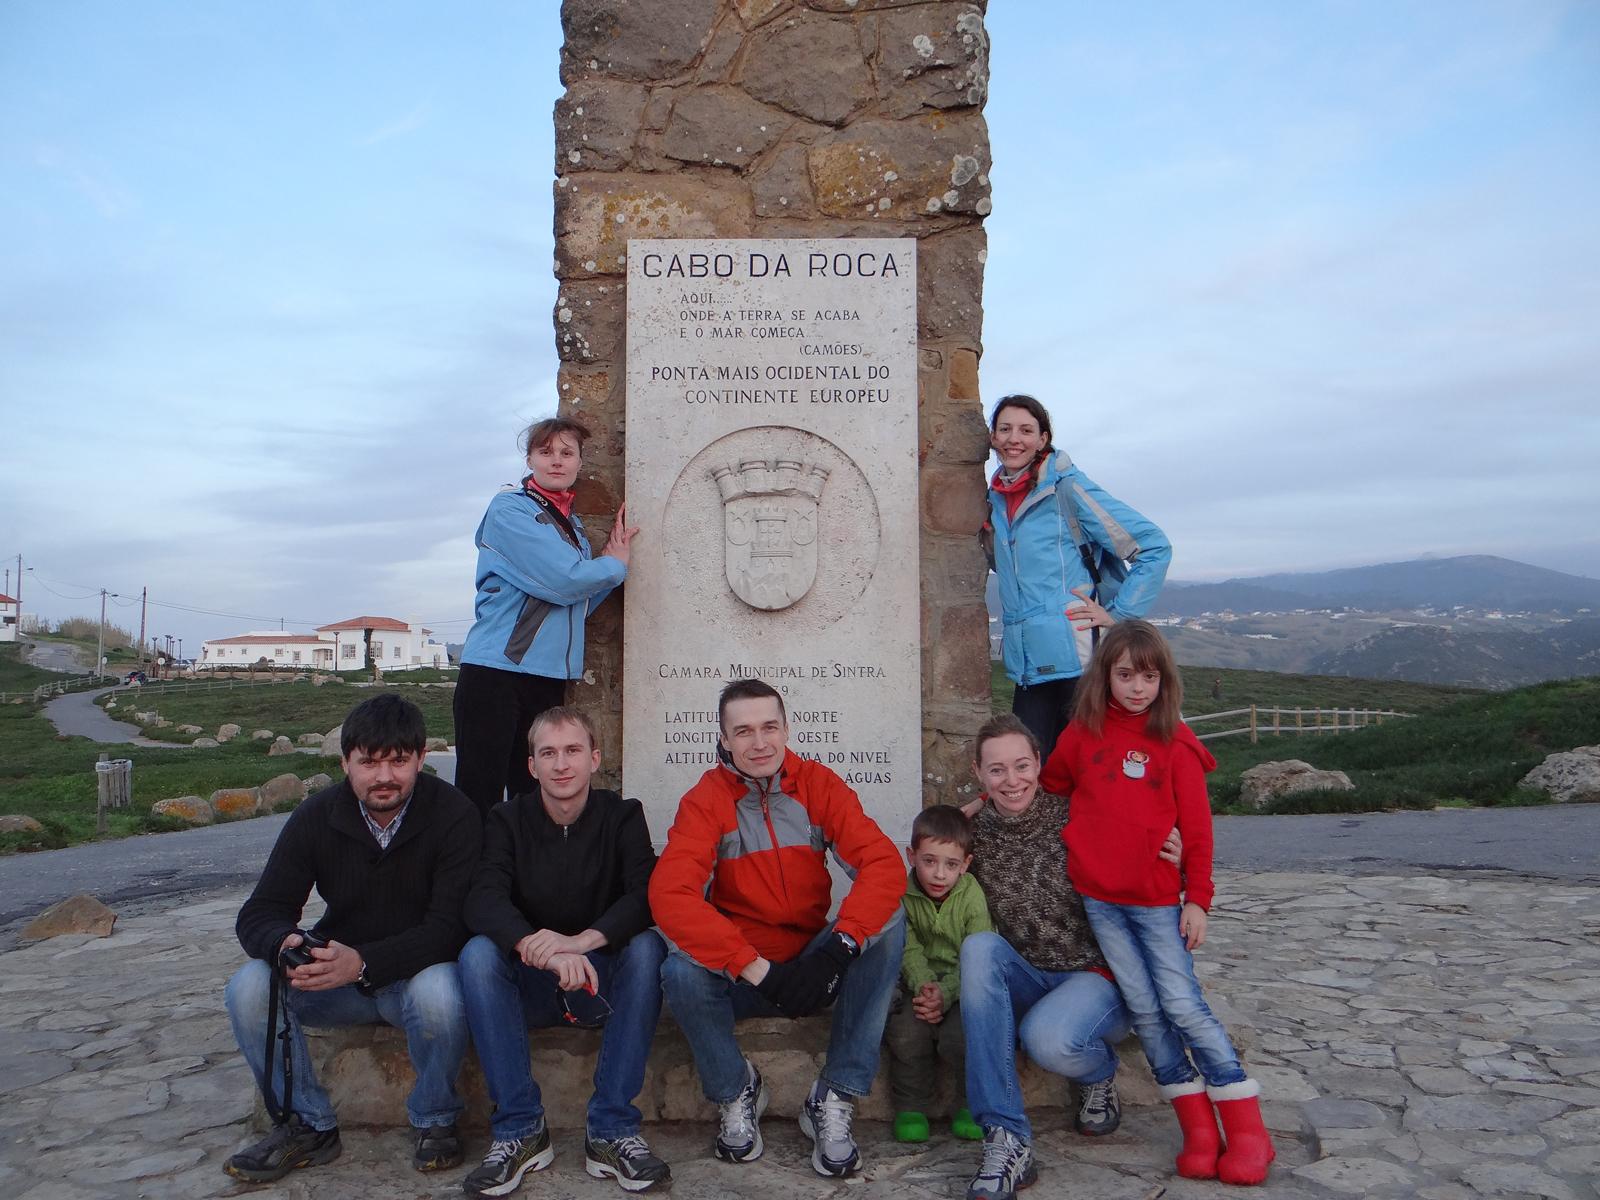 006_Cabo da Roca